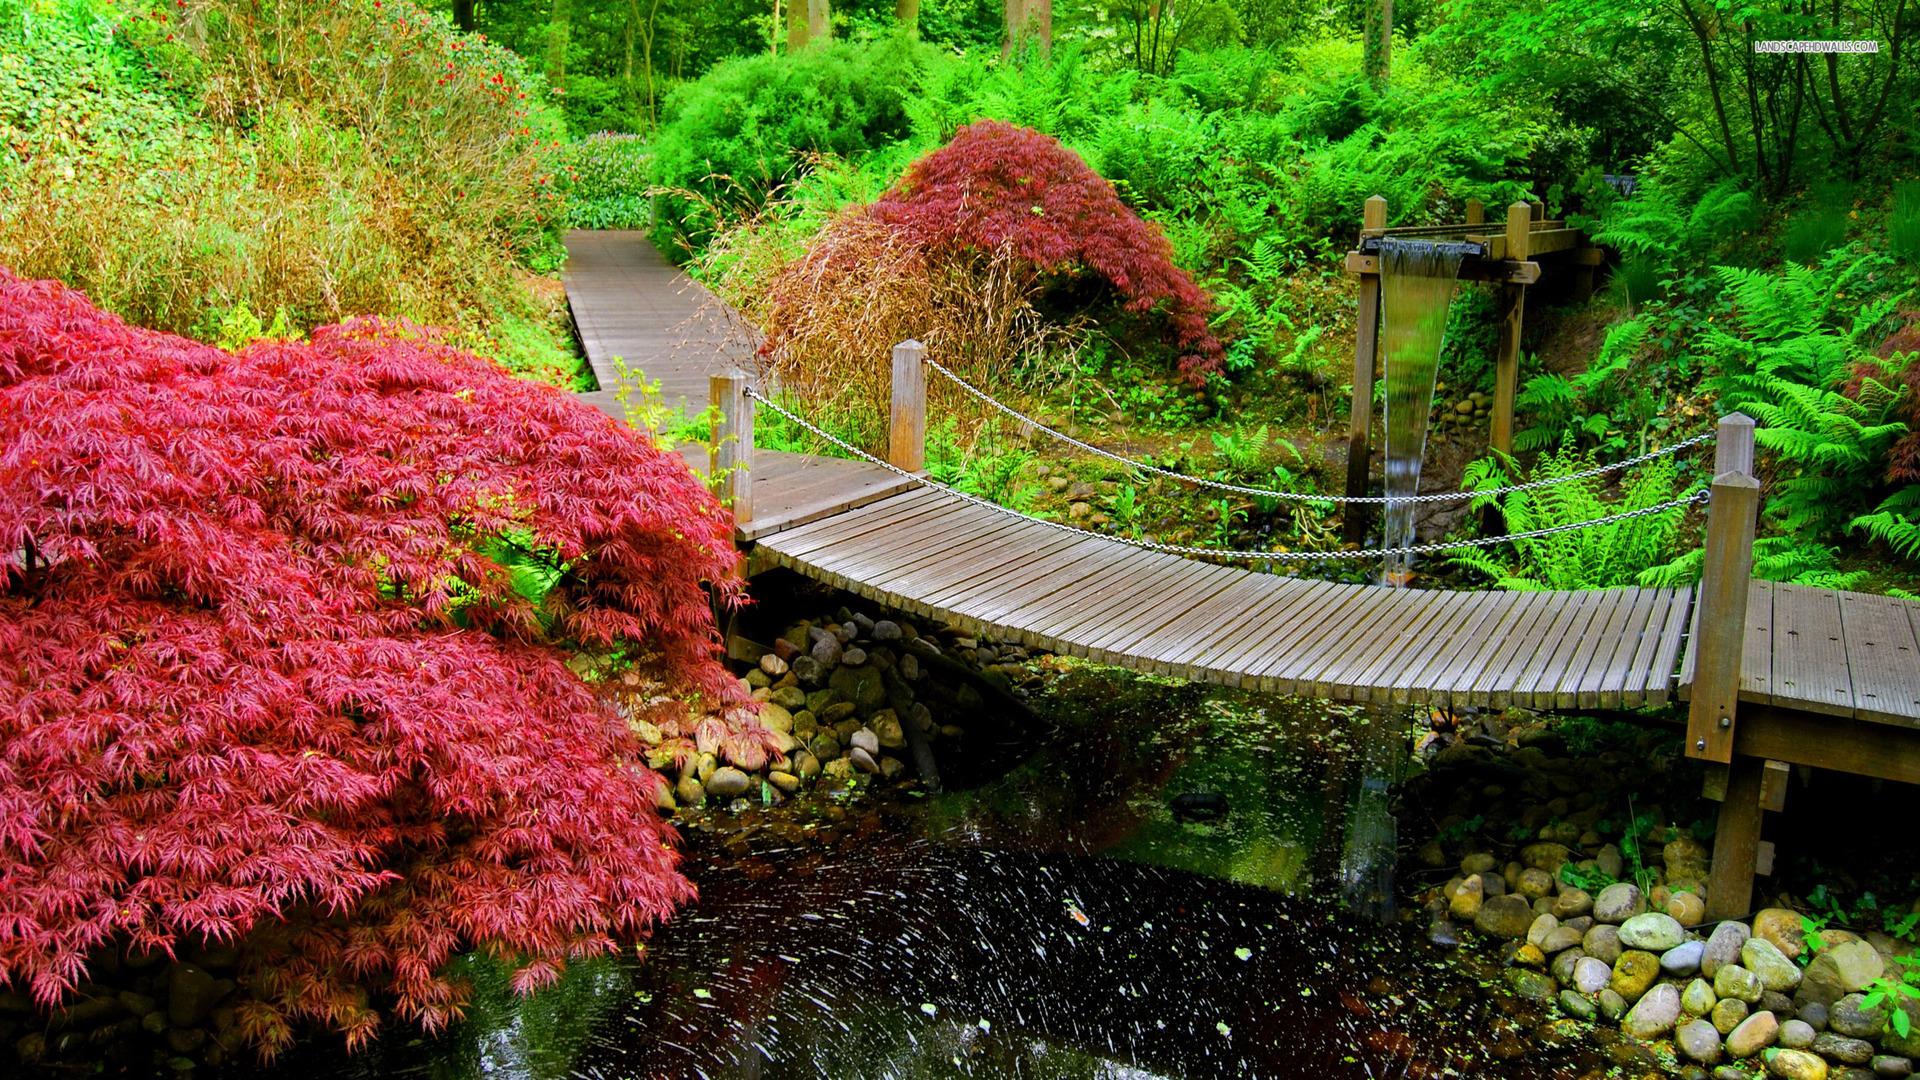 japanese-garden-2373-1920x1080 (1)